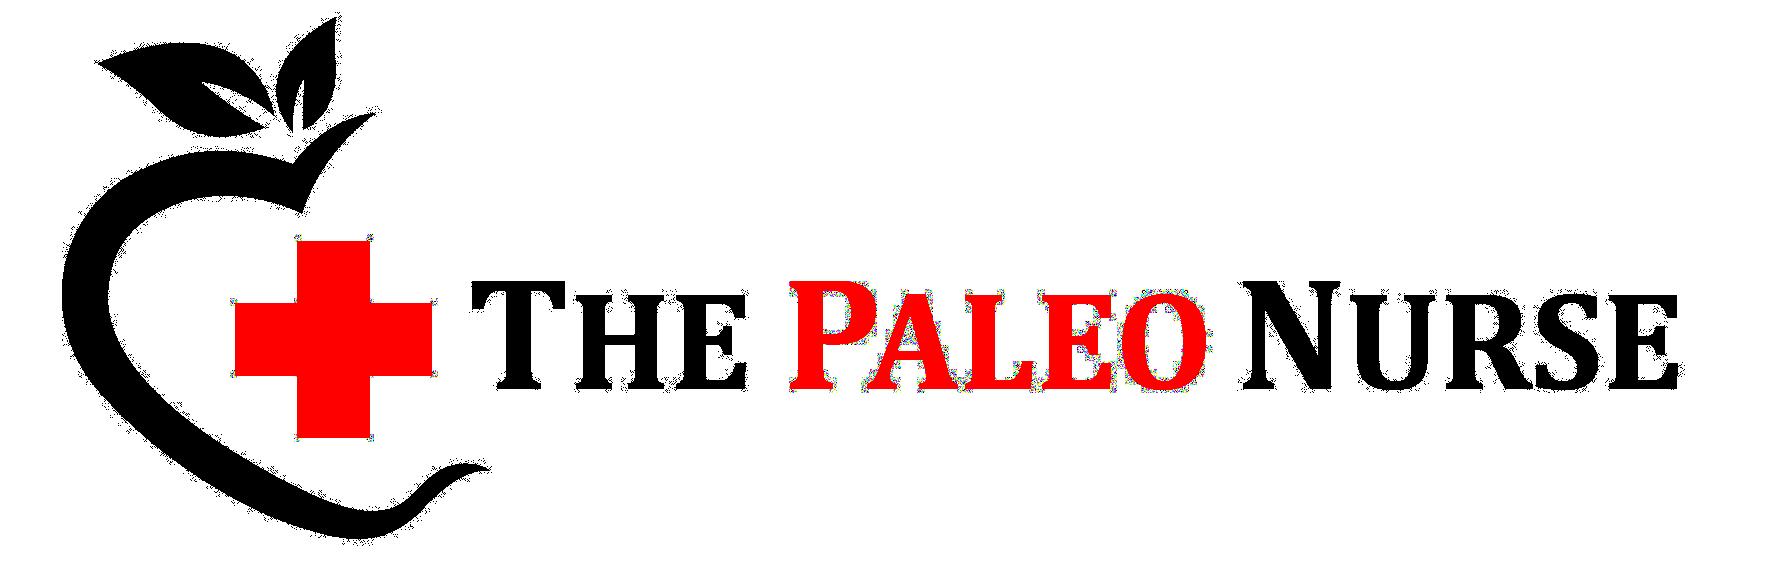 The Paleo Nurse